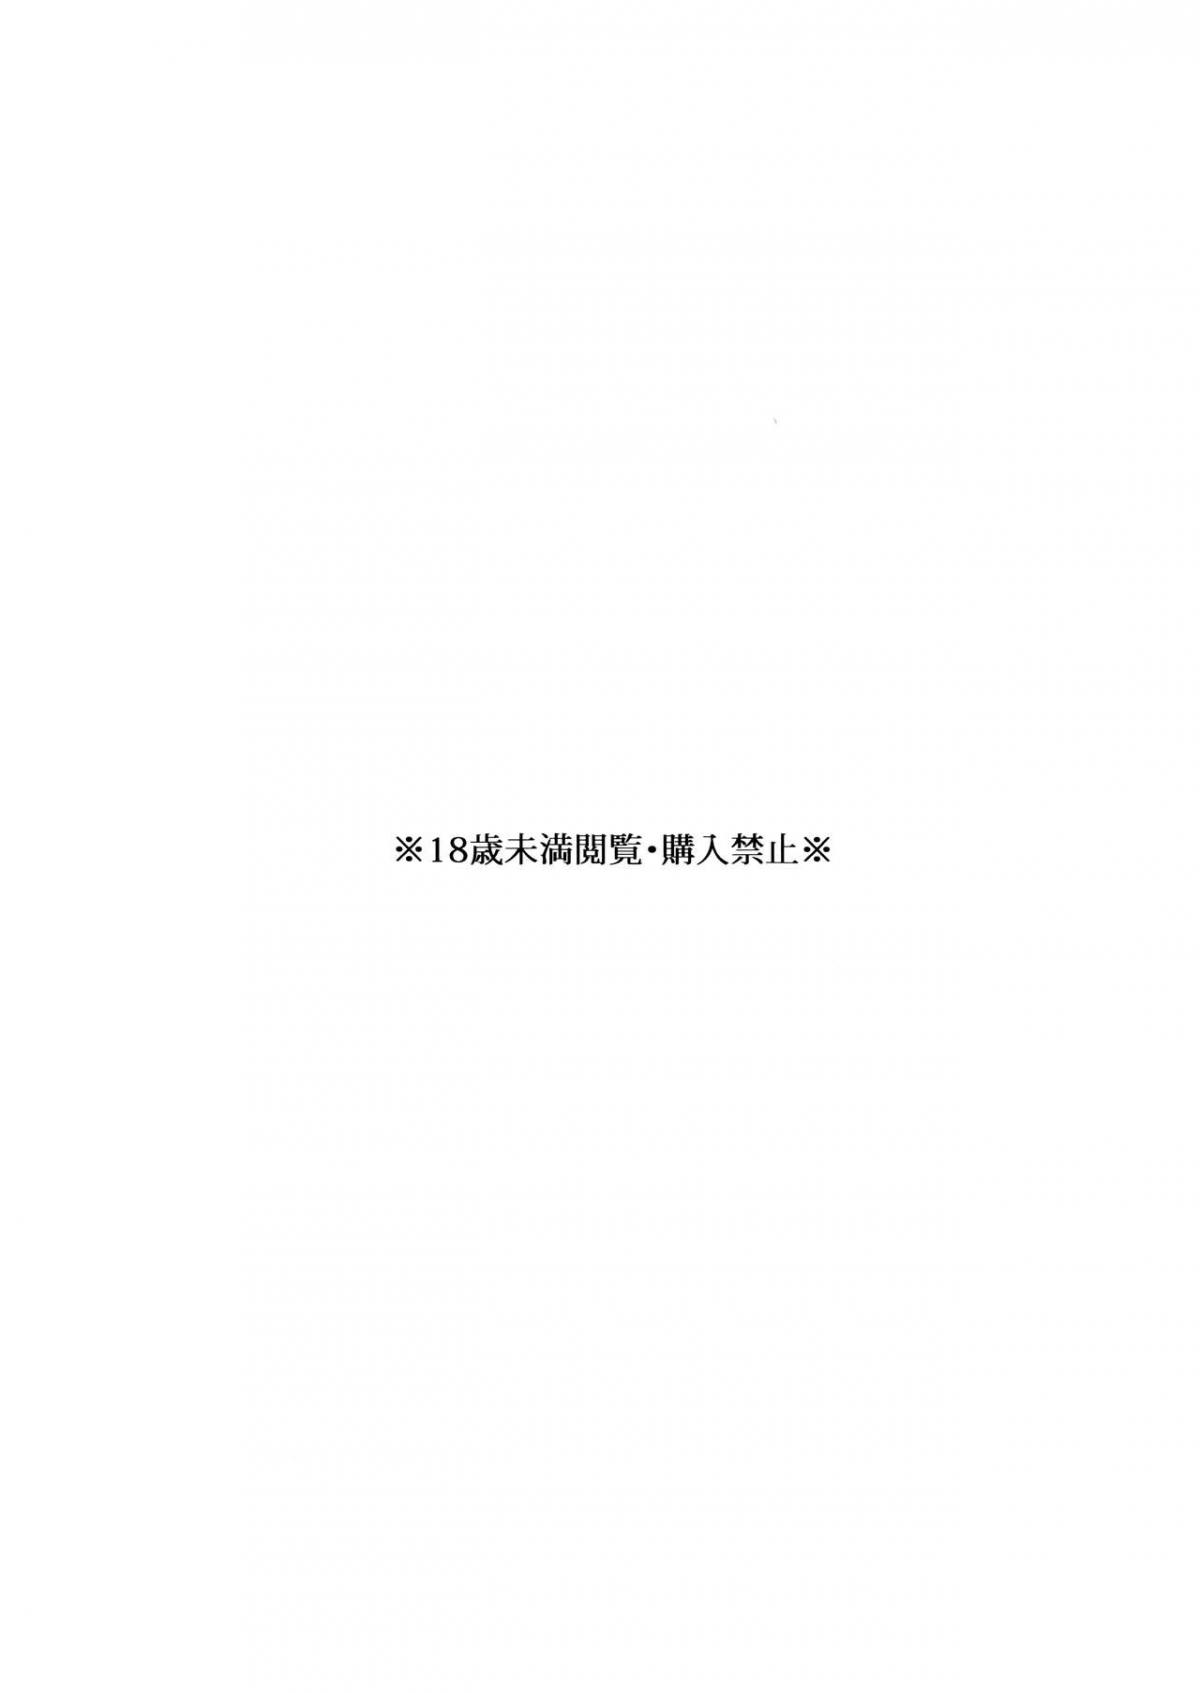 HentaiVN.net - Ảnh 4 - Yurari Oboreru Temptation (Collar x Malice) - Oneshot